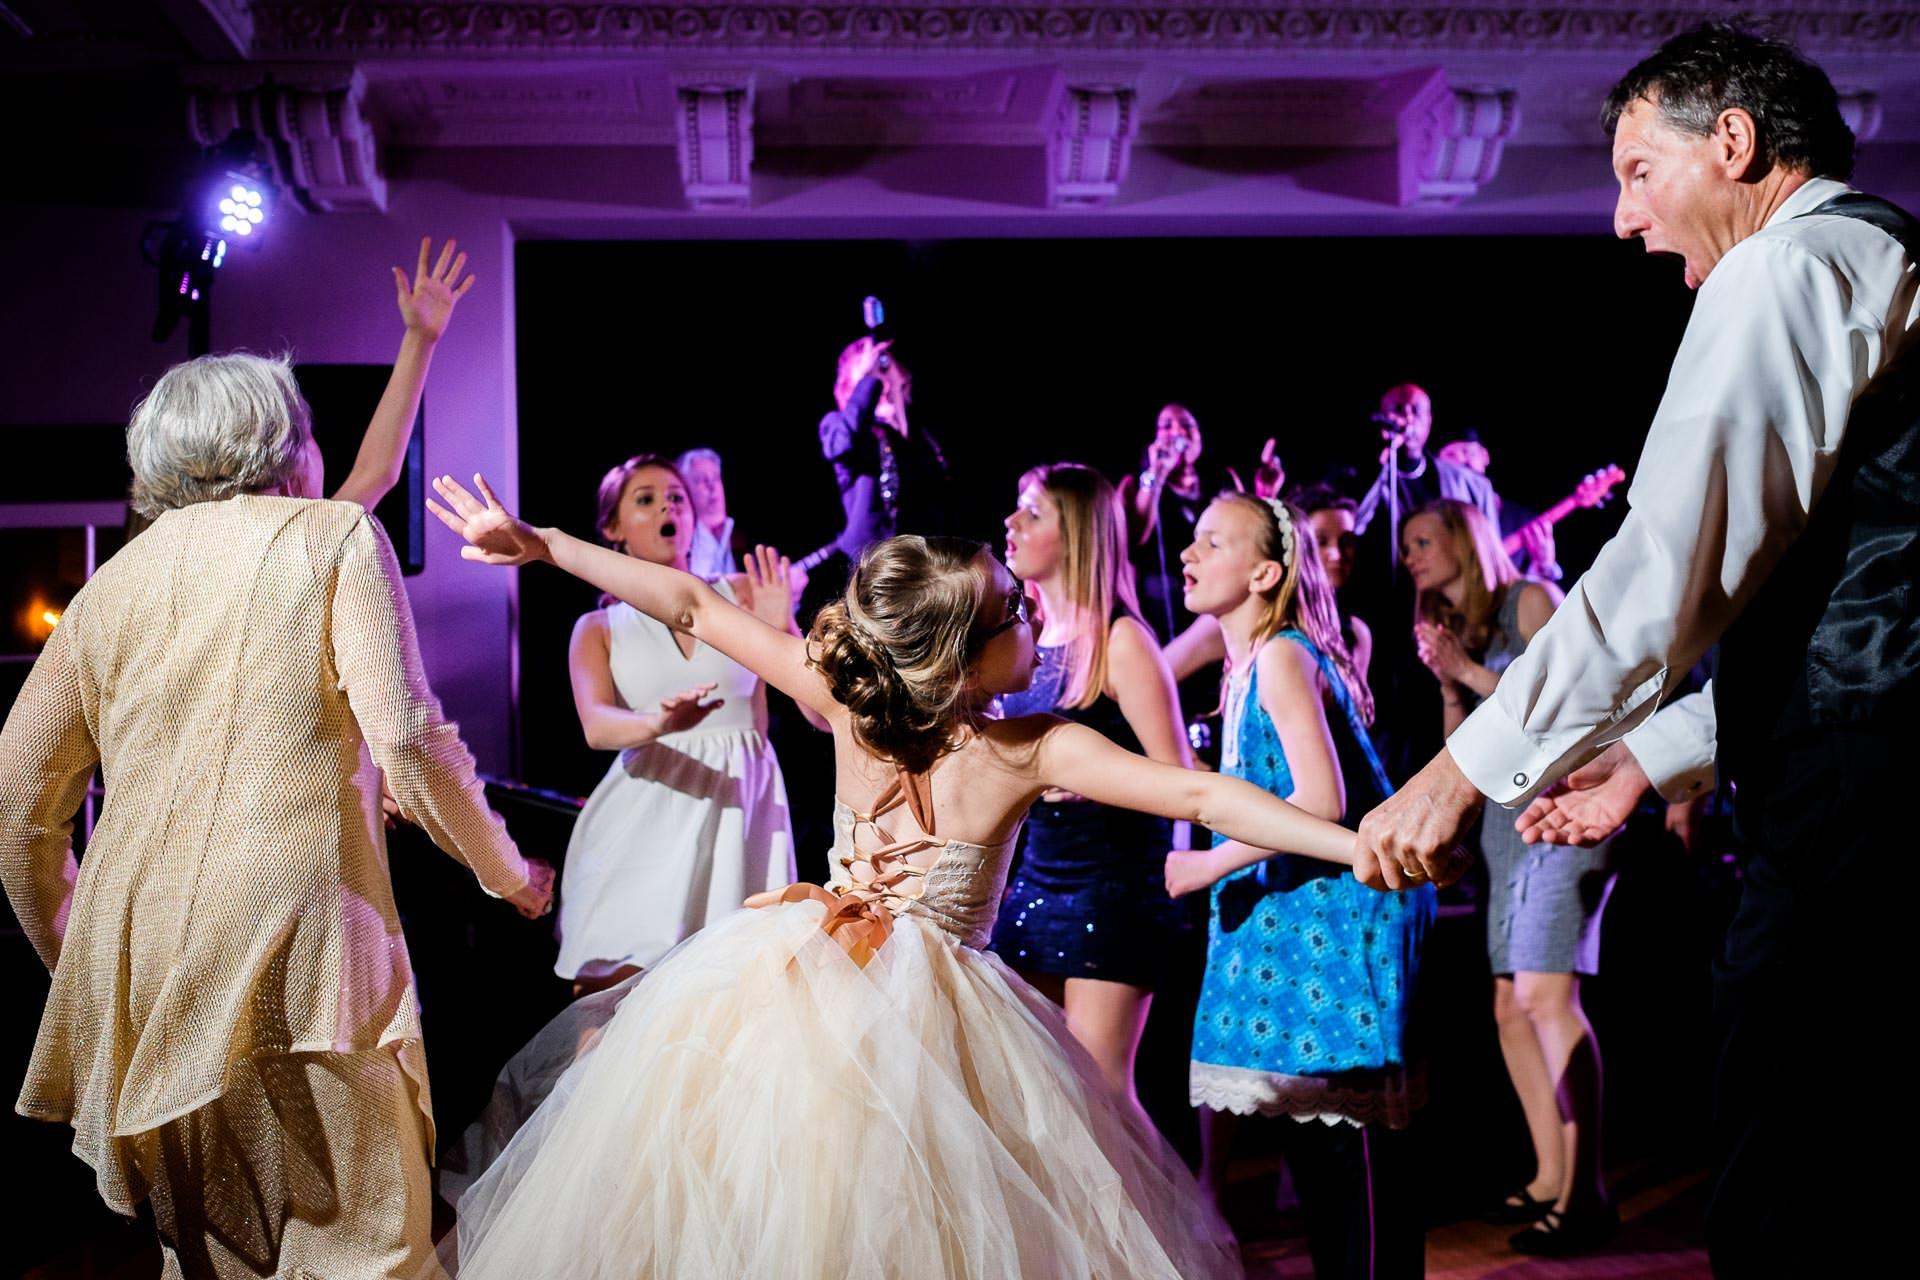 0071_KJFSaint-Paul-Athletic-Club-Wedding-Reception